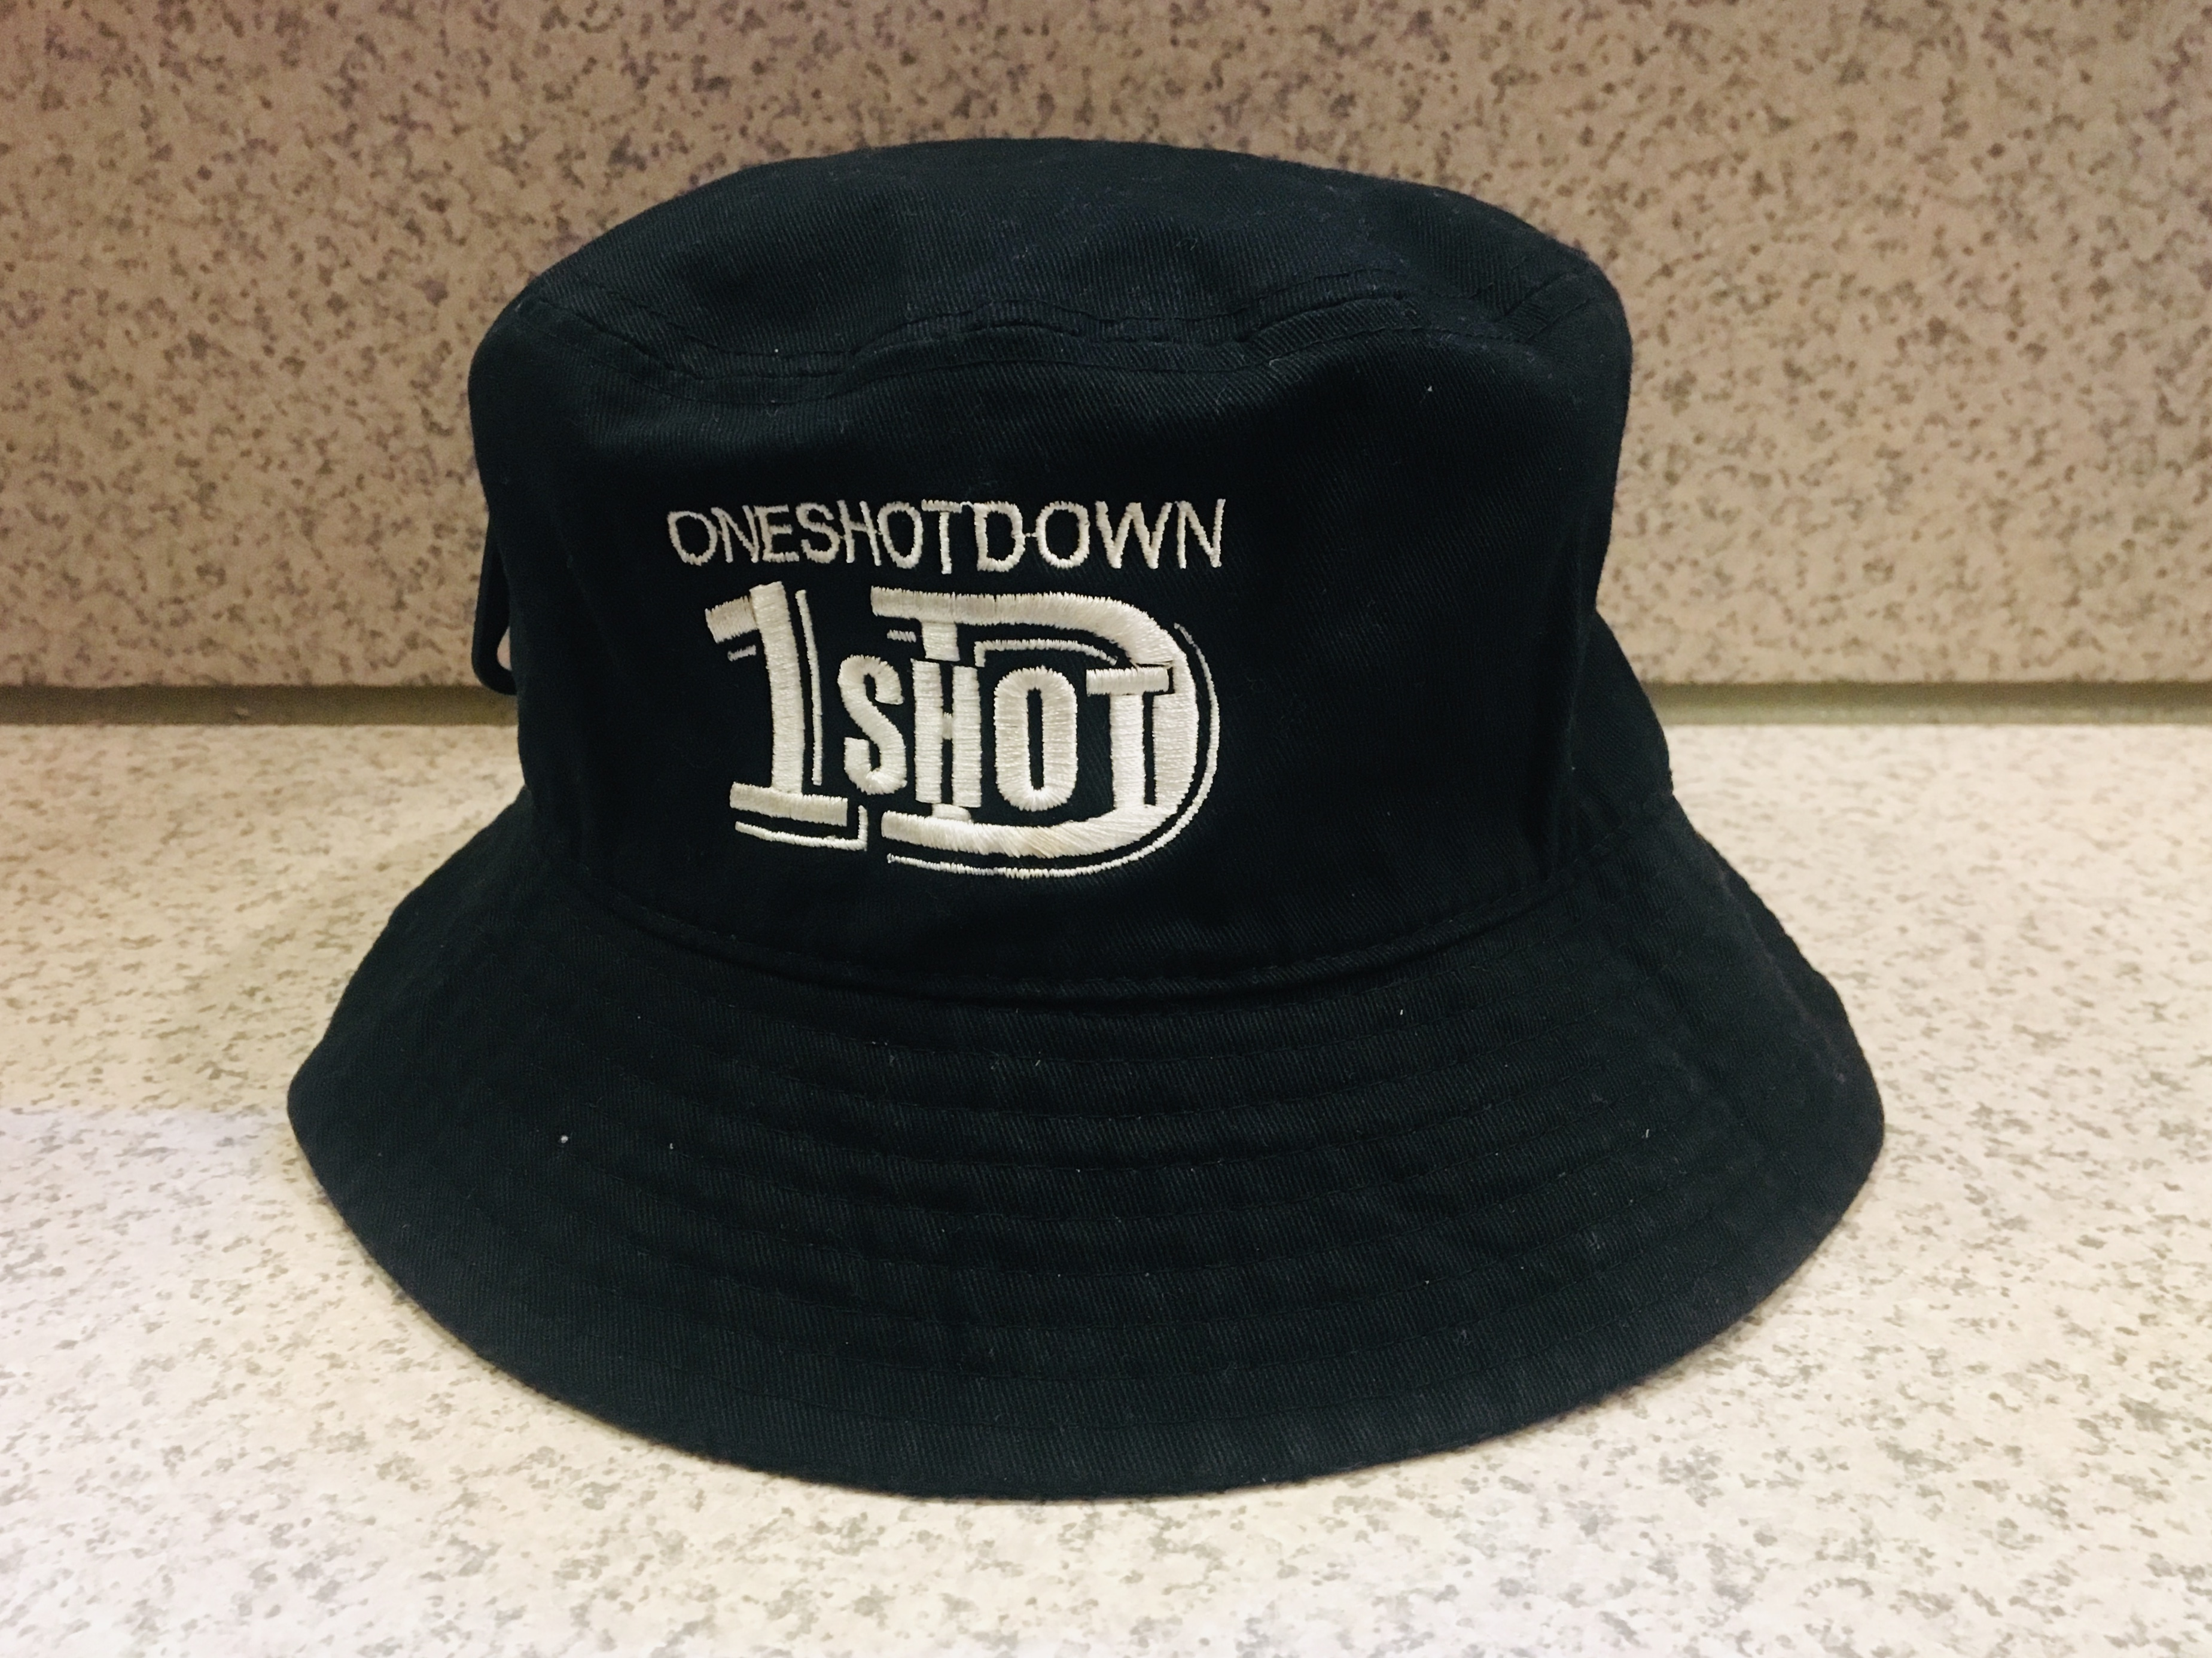 ONESHOTDOWN バケットハット - 画像4